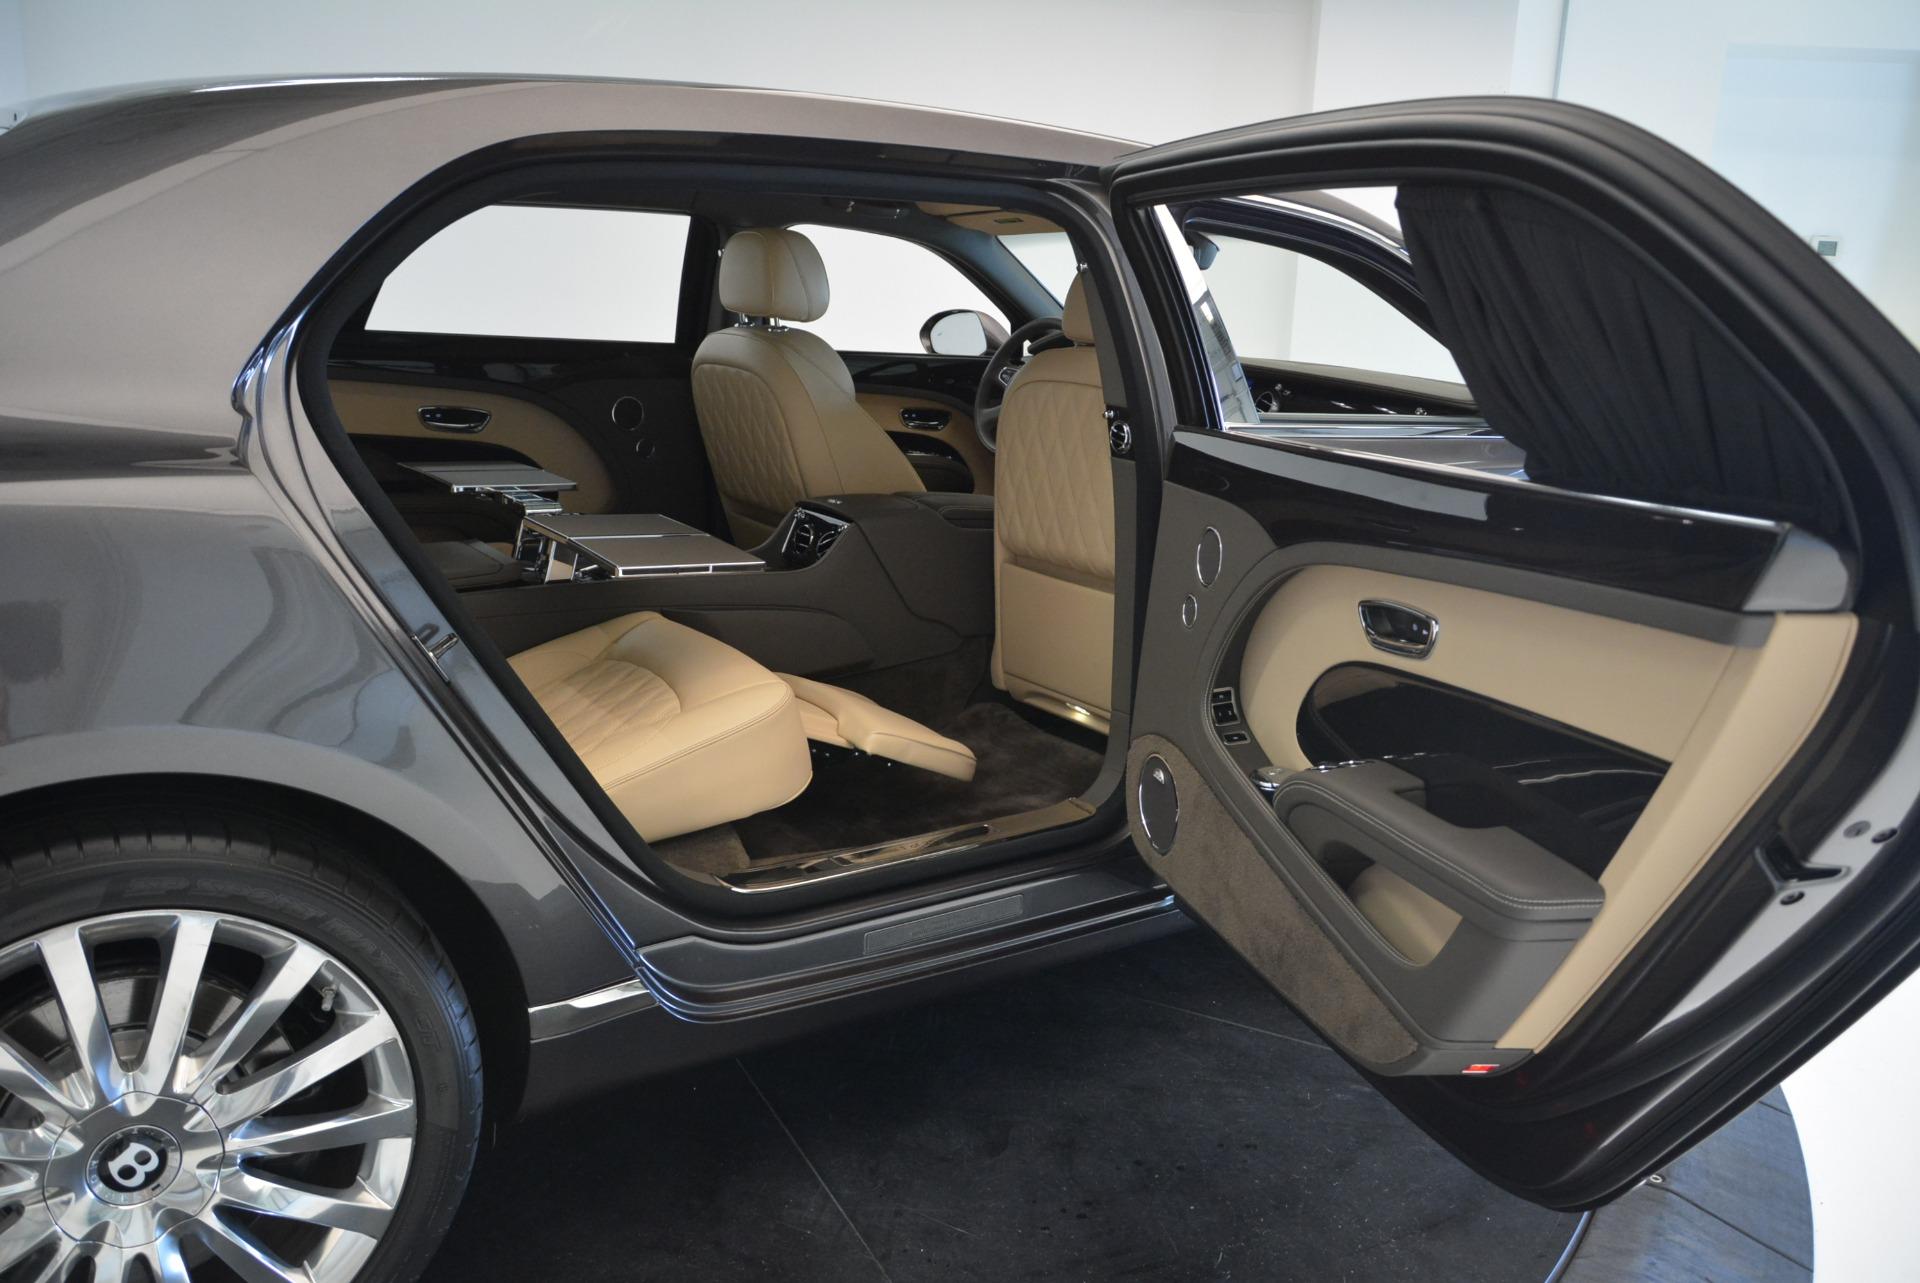 Used 2017 Bentley Mulsanne EWB For Sale In Greenwich, CT 1554_p31